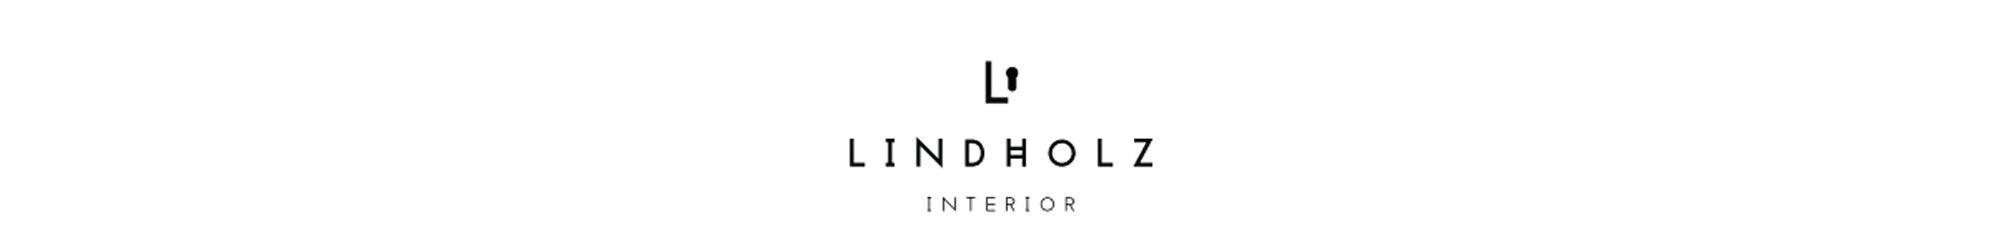 LINDHOLZ INTERIOR